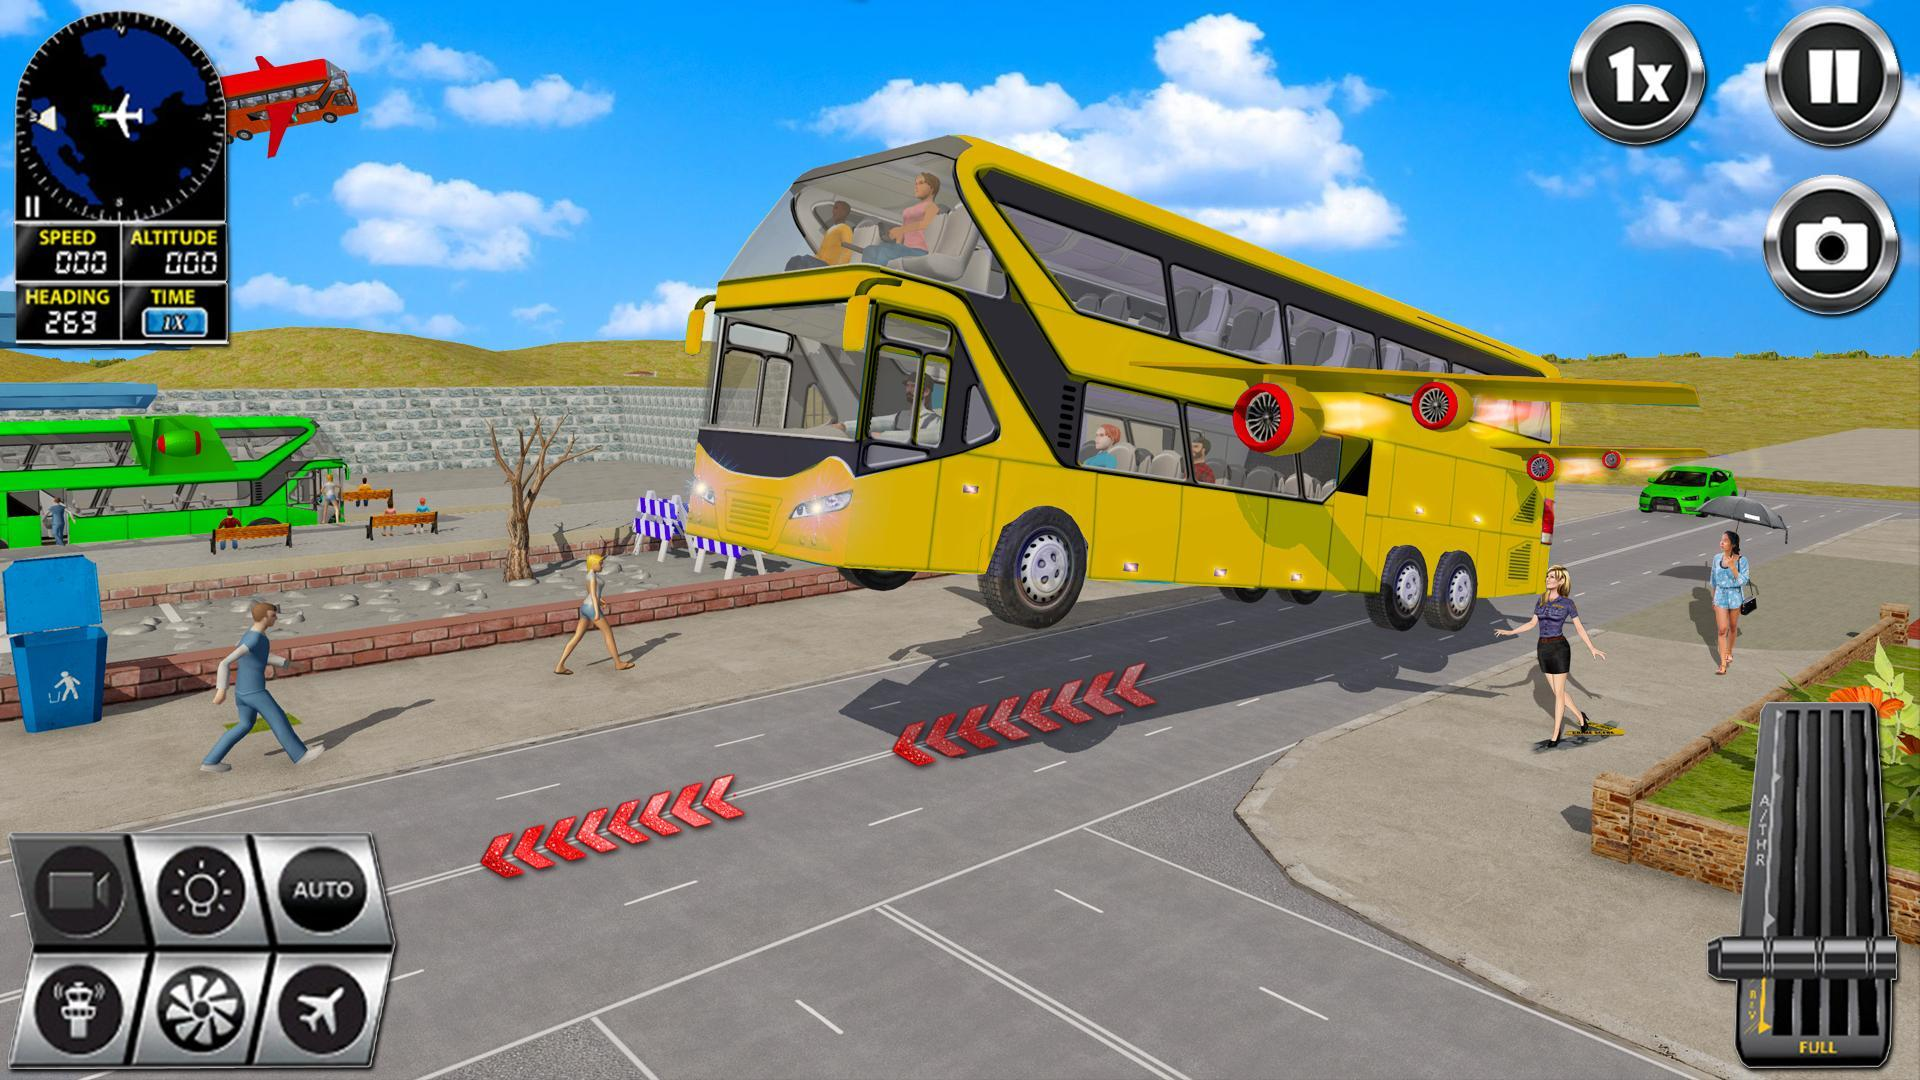 Flying Bus Driving simulator 2019: Free Bus Games 2.8 Screenshot 2